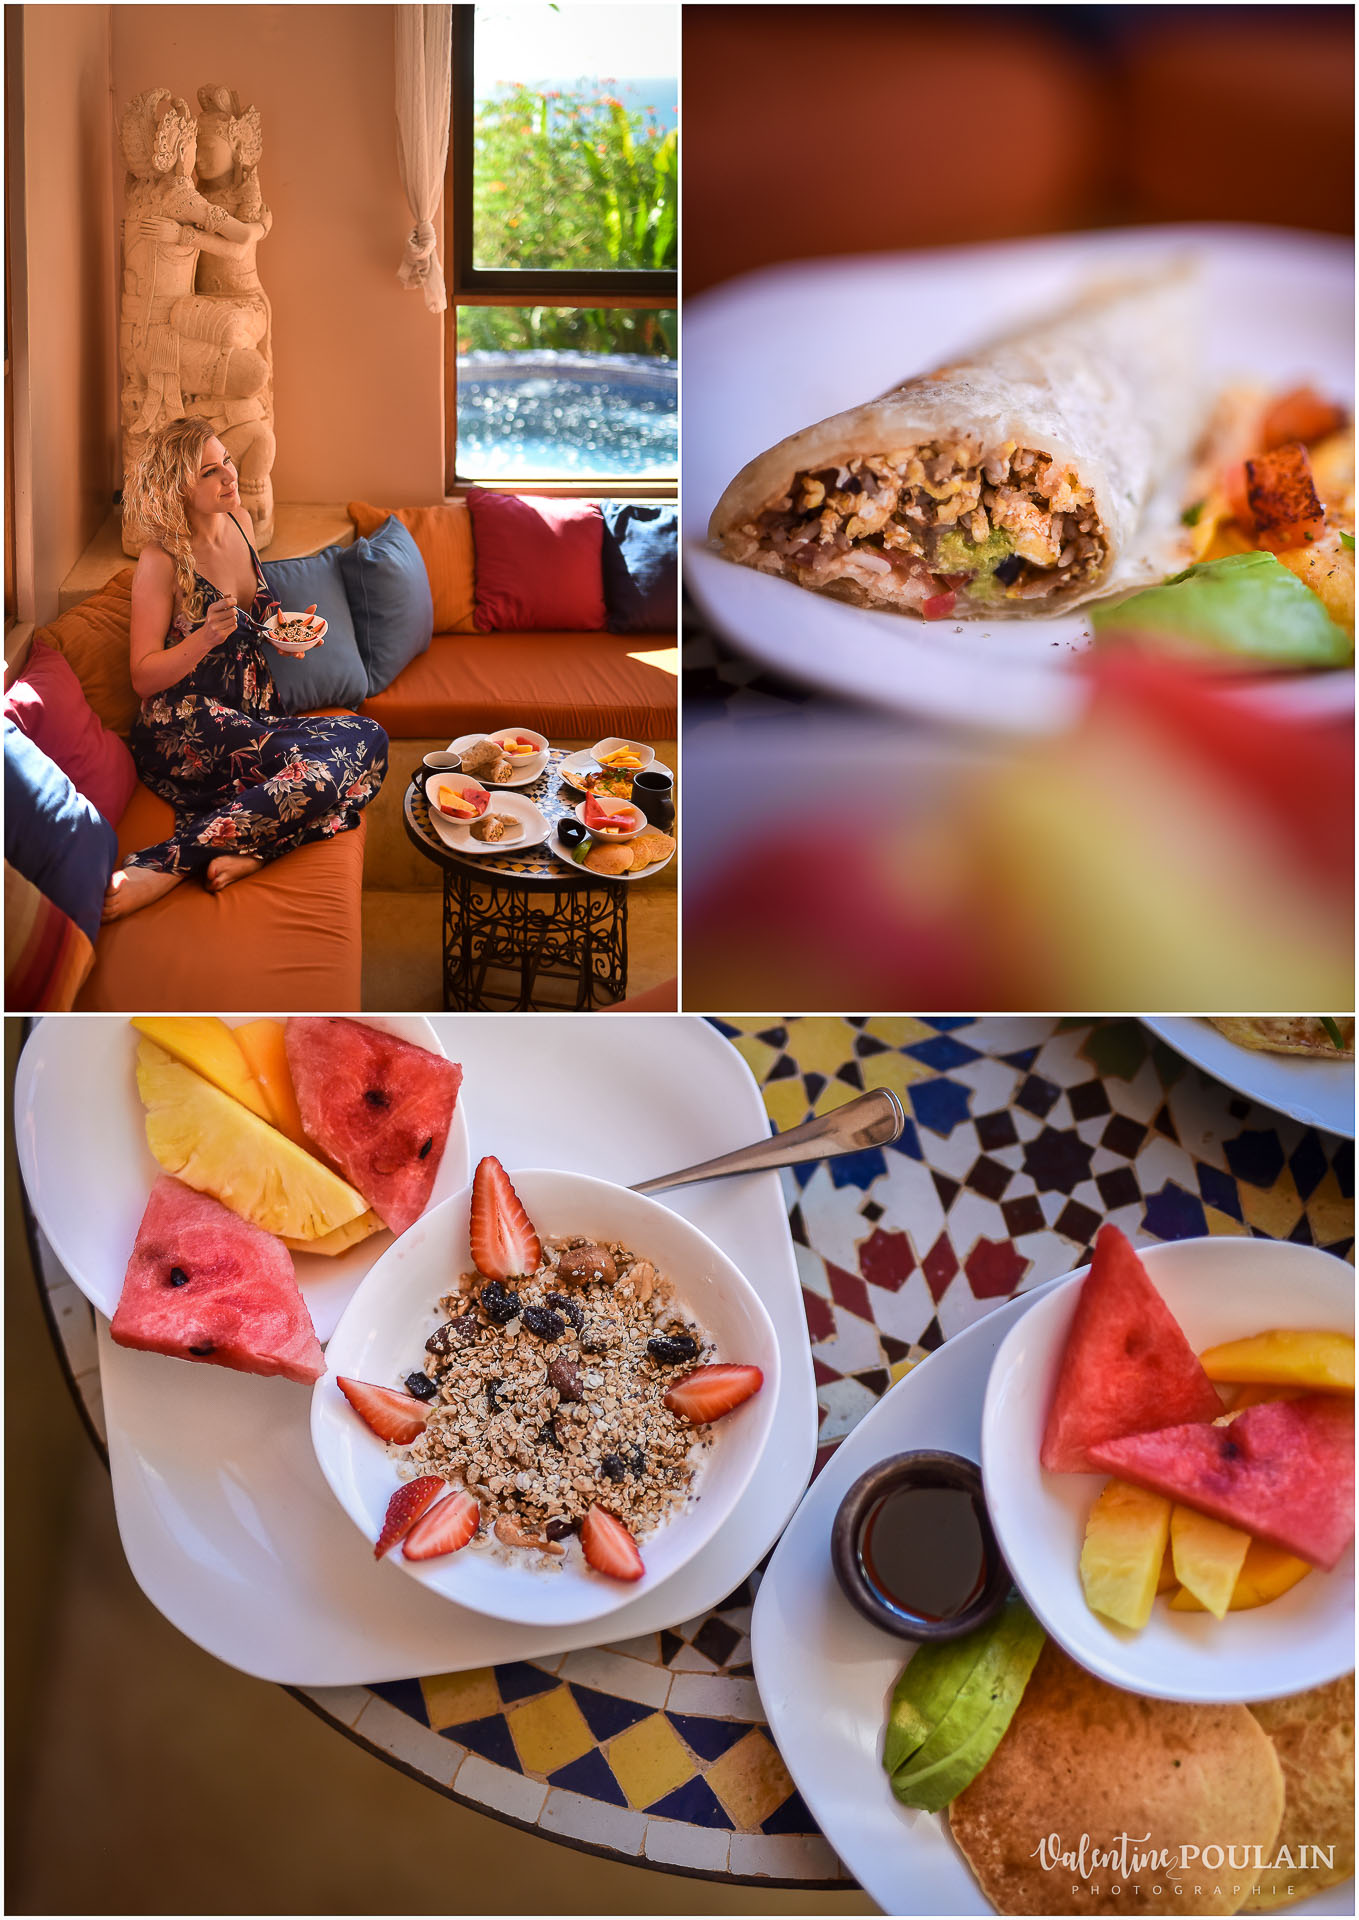 Photo Hotel Costa Rica ANAMAYA_ Valentine Poulain food